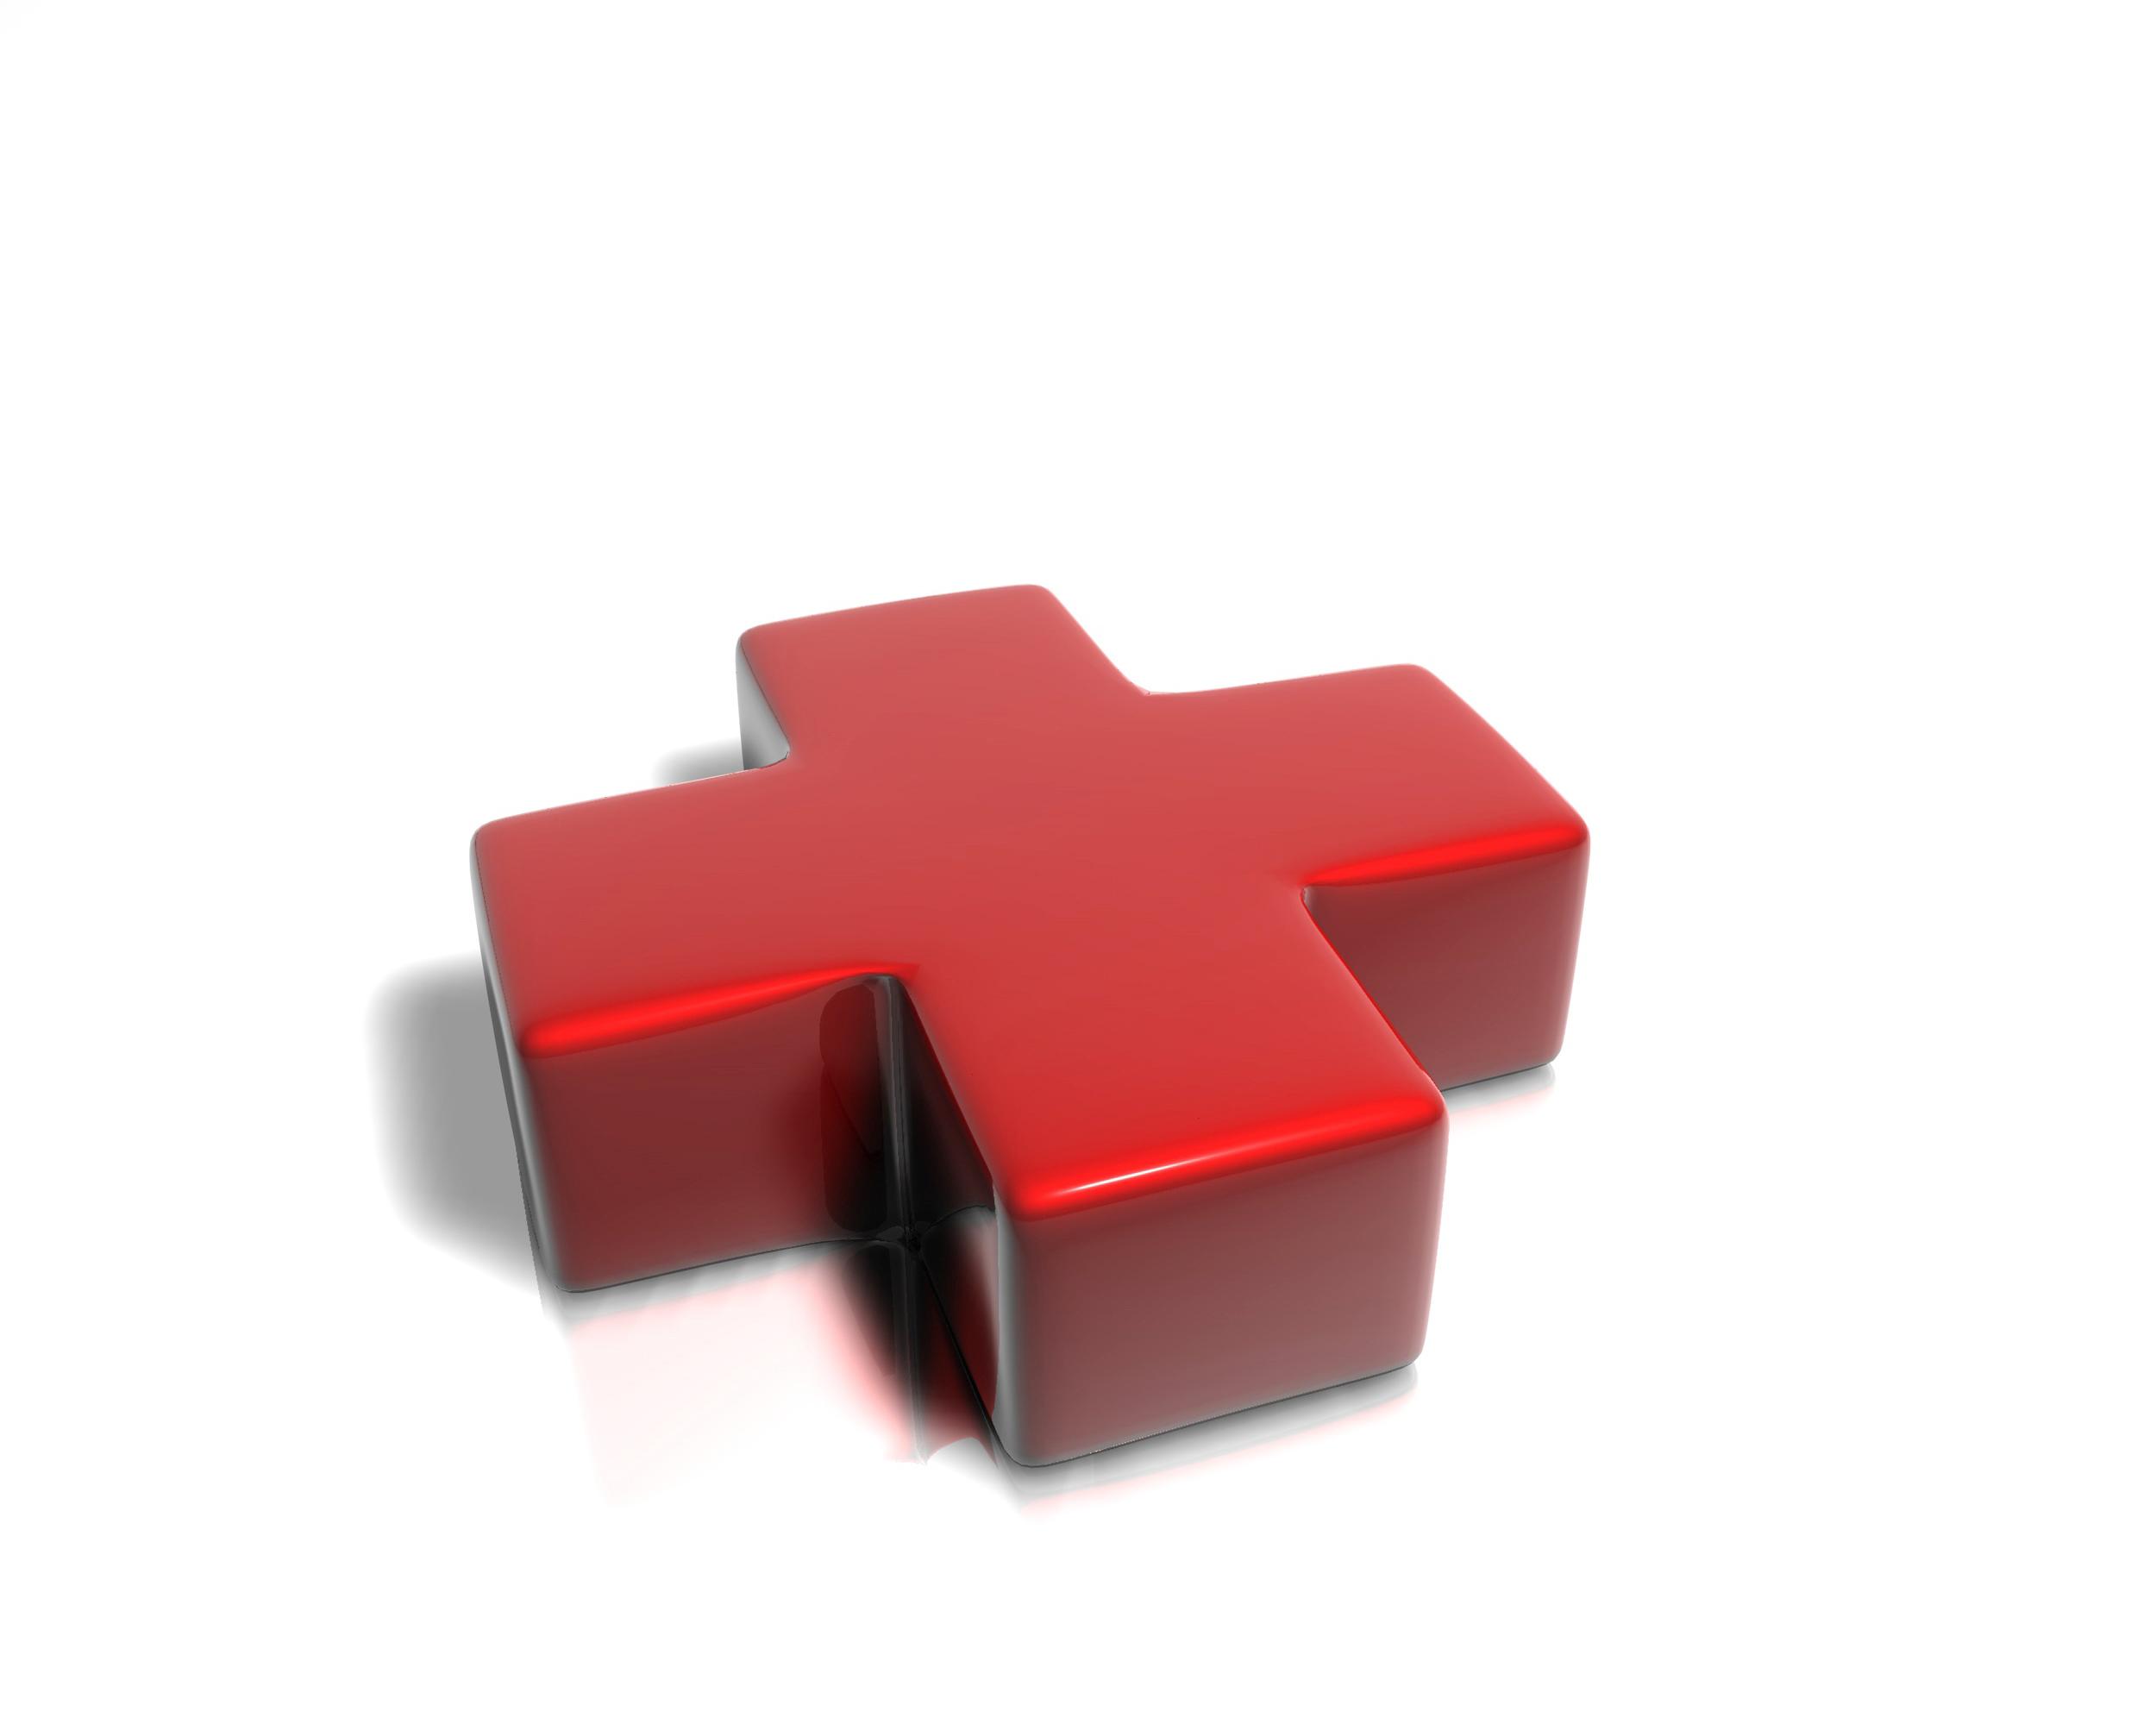 Level 3 Award Emergency  First Aid At Work (RQF)